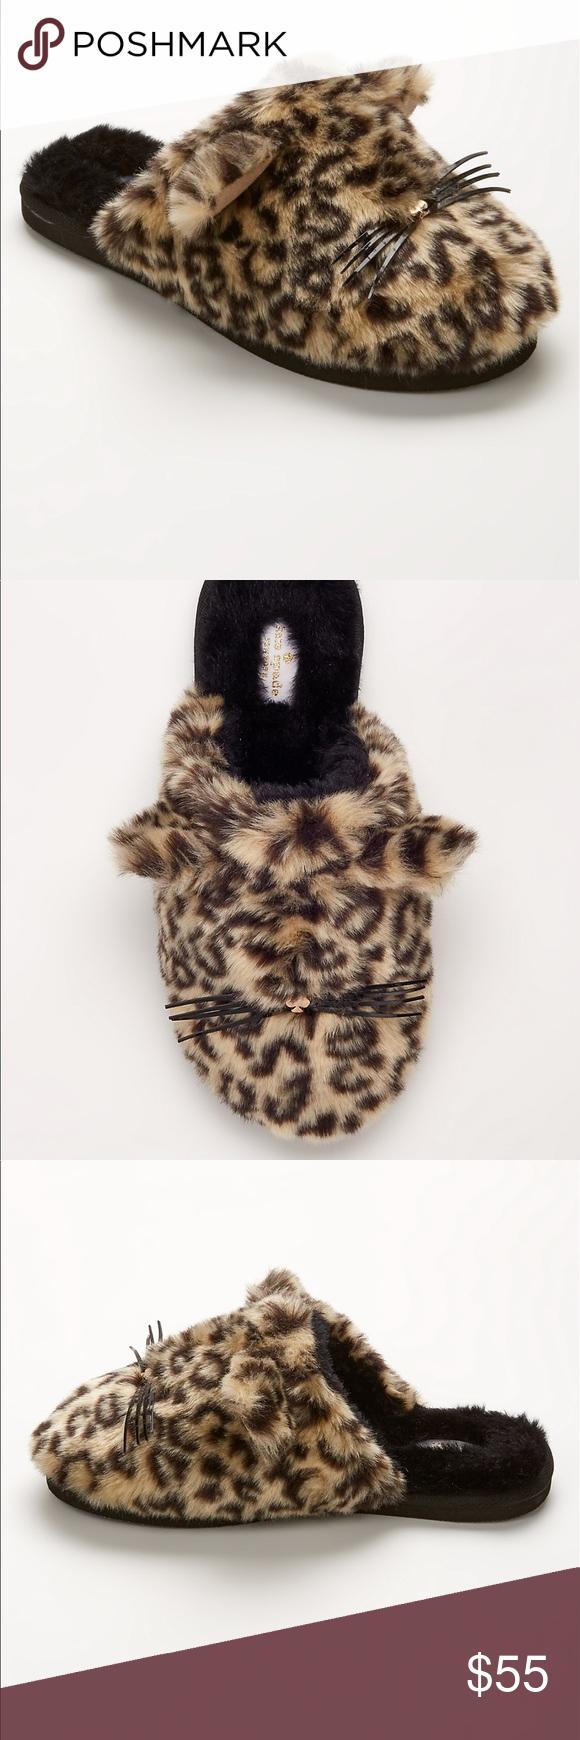 47b23d33f7eb Kate Spade Belinda faux fur cat slippers -7 Brand new. No box Kate Spade